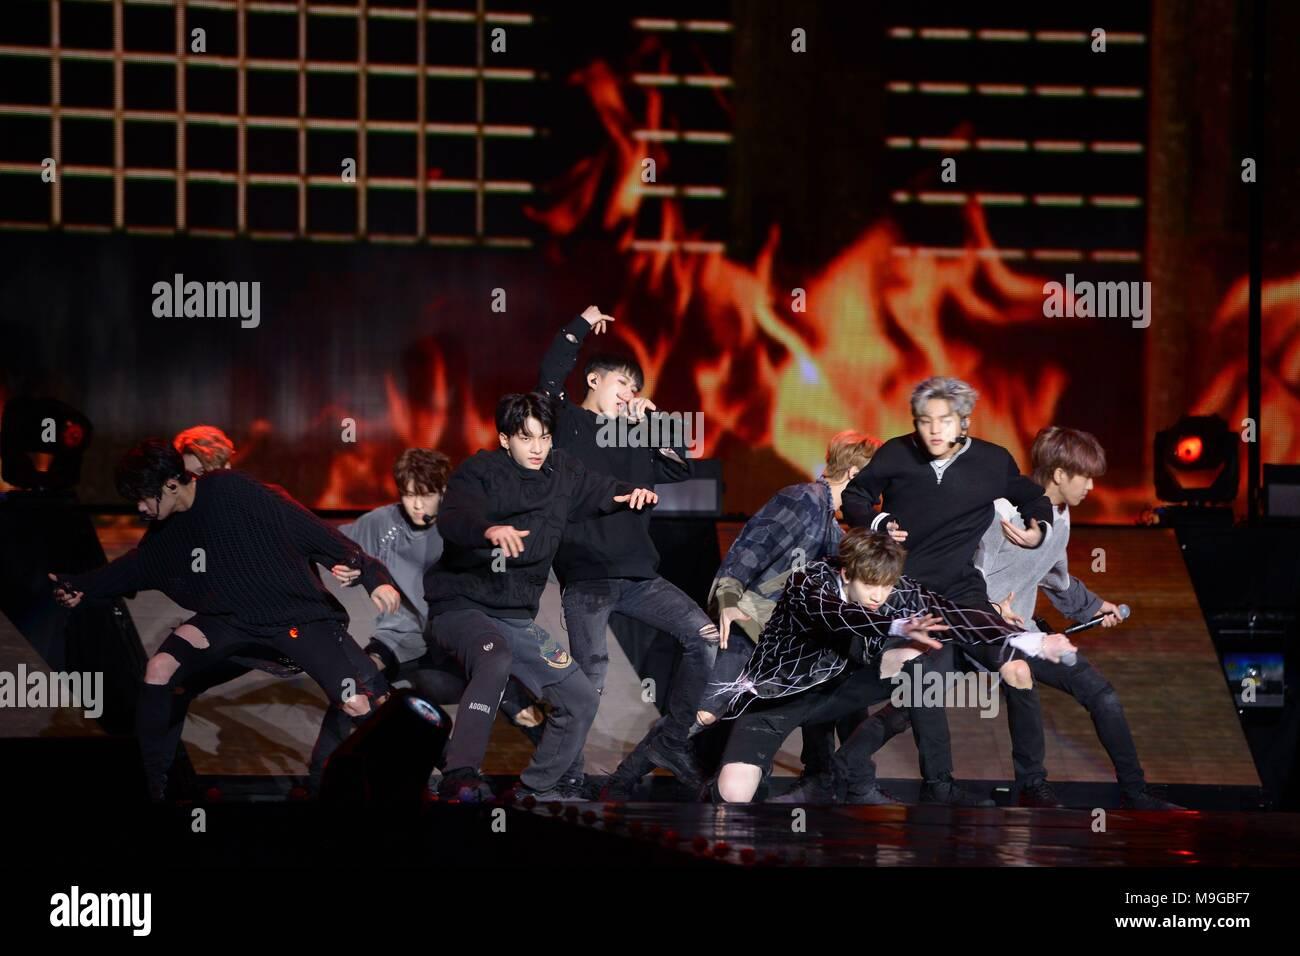 JYP new idol group Stray Kids hold debut showcase in Seoul